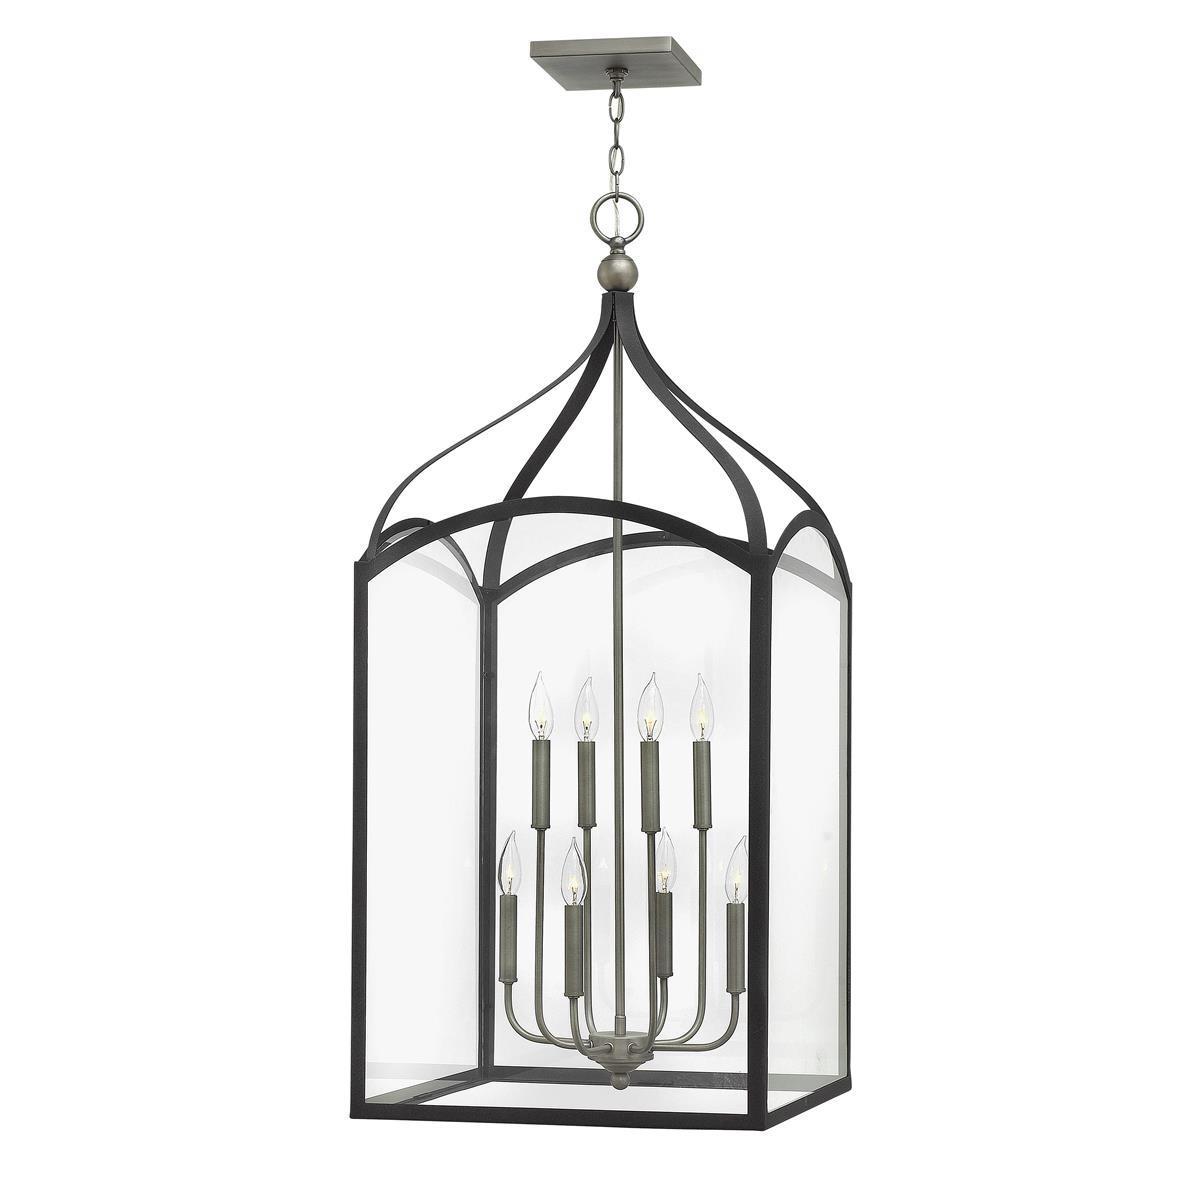 Favorite Hinkley Lighting Clarendon Series 3418Bz Lantern – Searchlighting Regarding Modern Latern Hinkley Lighting (View 6 of 20)